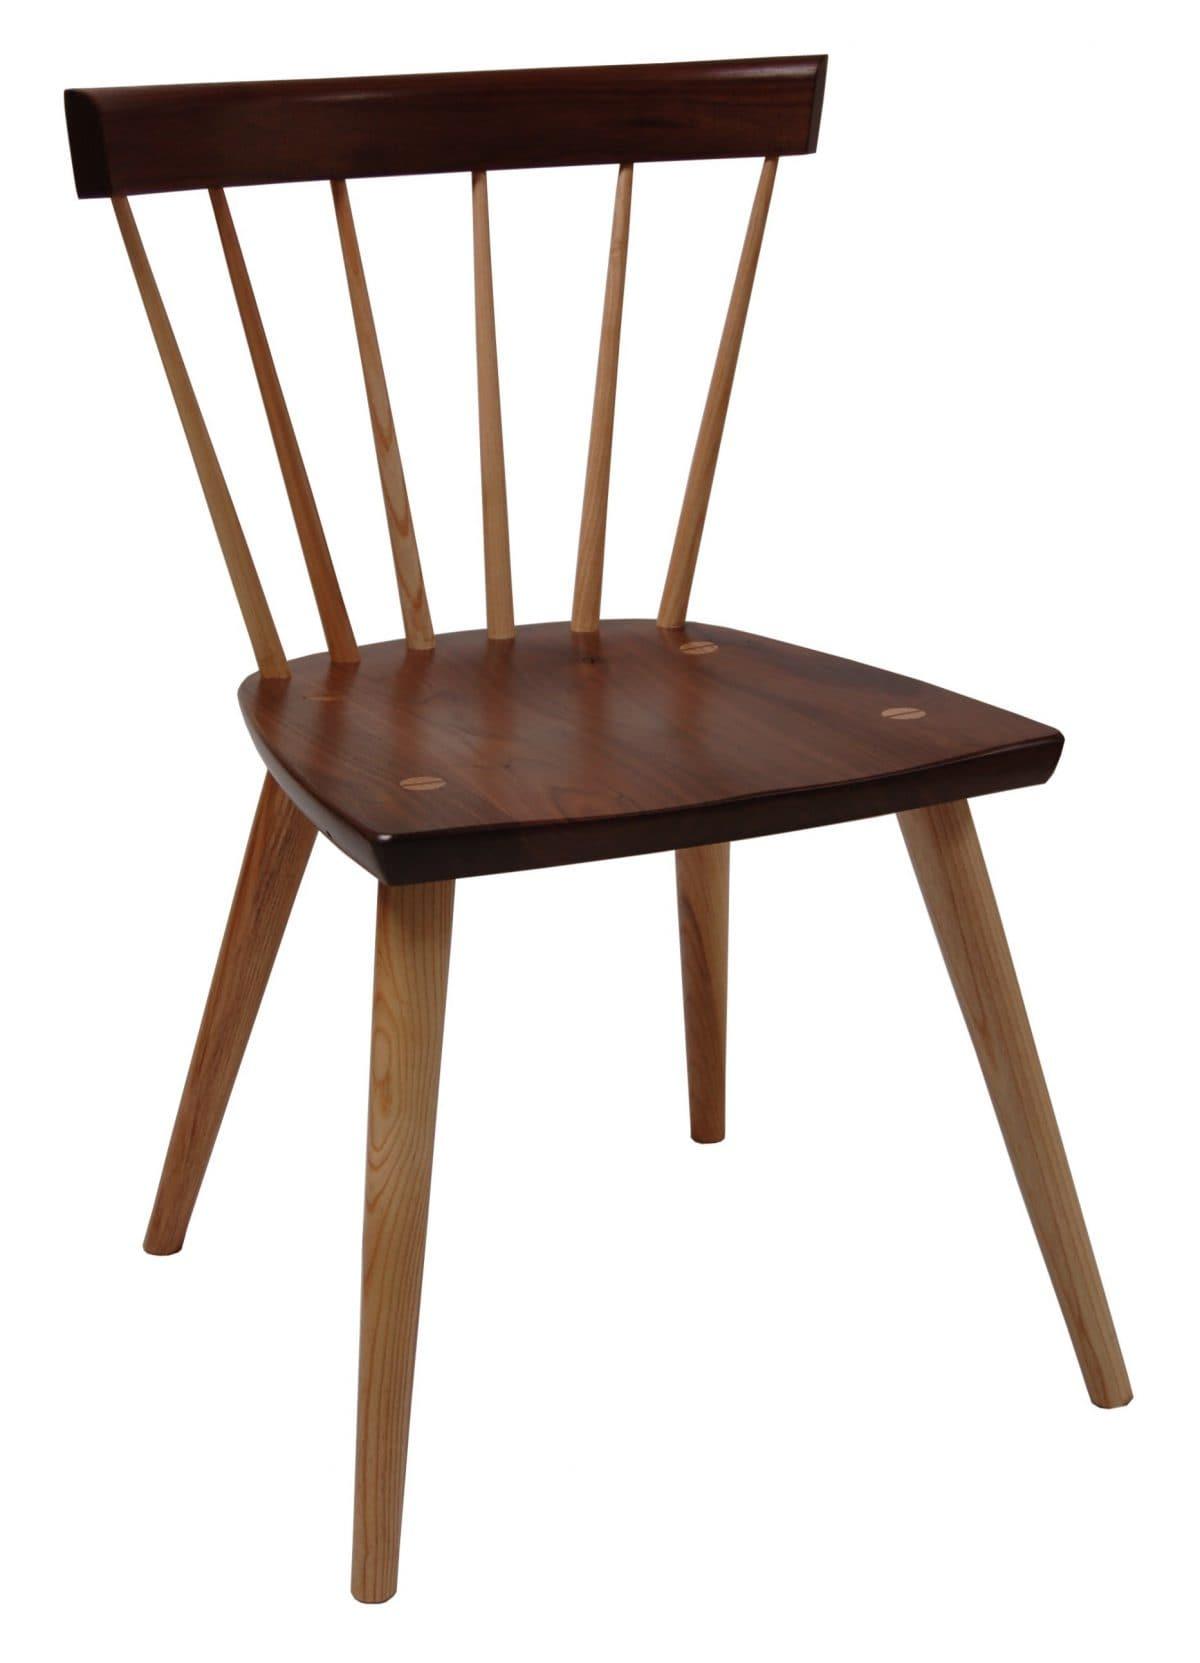 Photo of: HW Bradford Chair